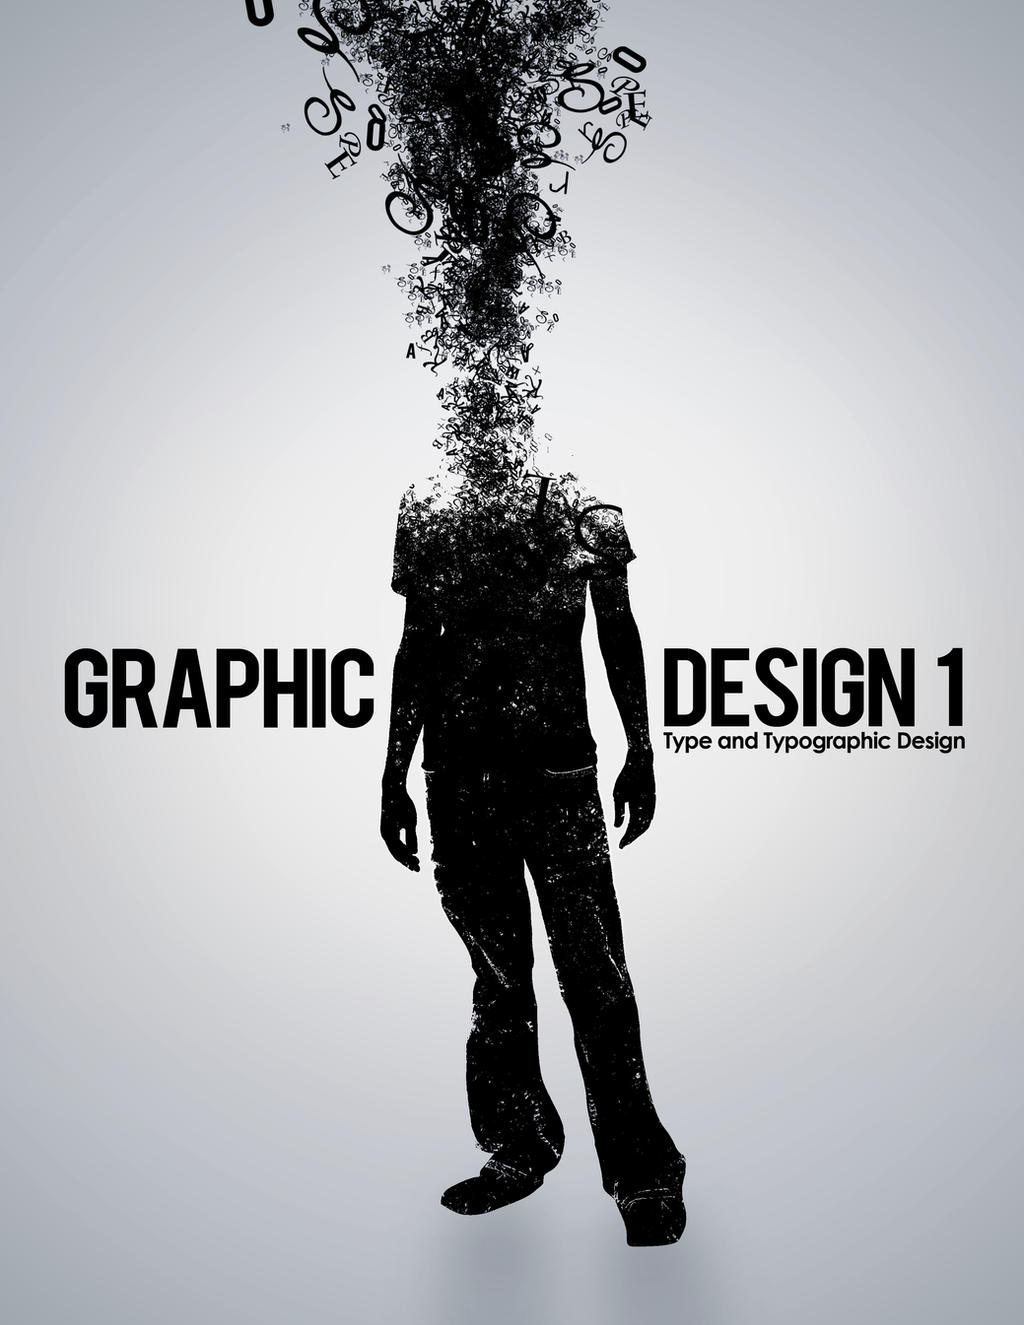 Poster design deviantart - Graphic Design 1 Poster By Mechatron2300